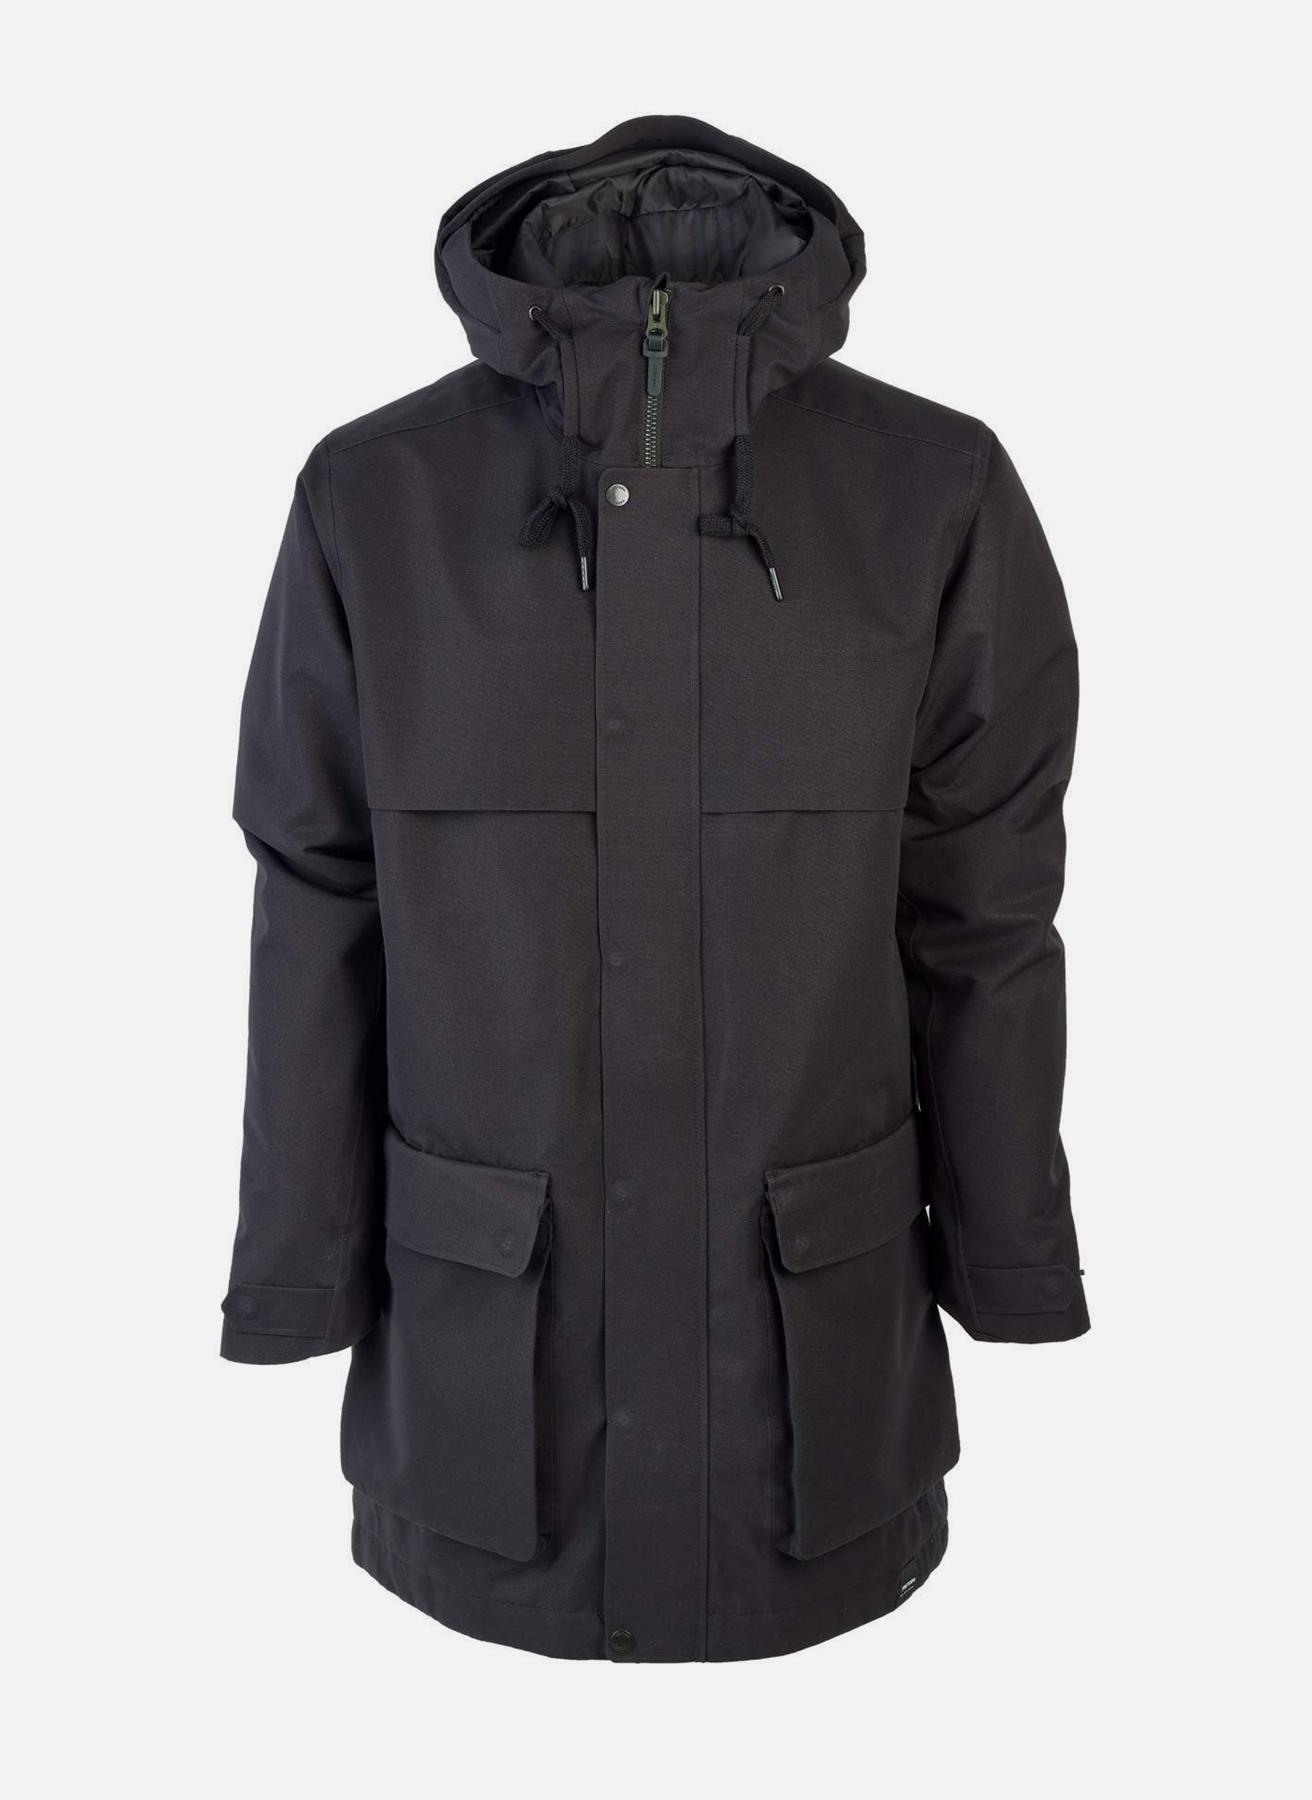 tretorn-arch-jacket-men-jet-black-475702-11-01_1280x1280@2x.jpg